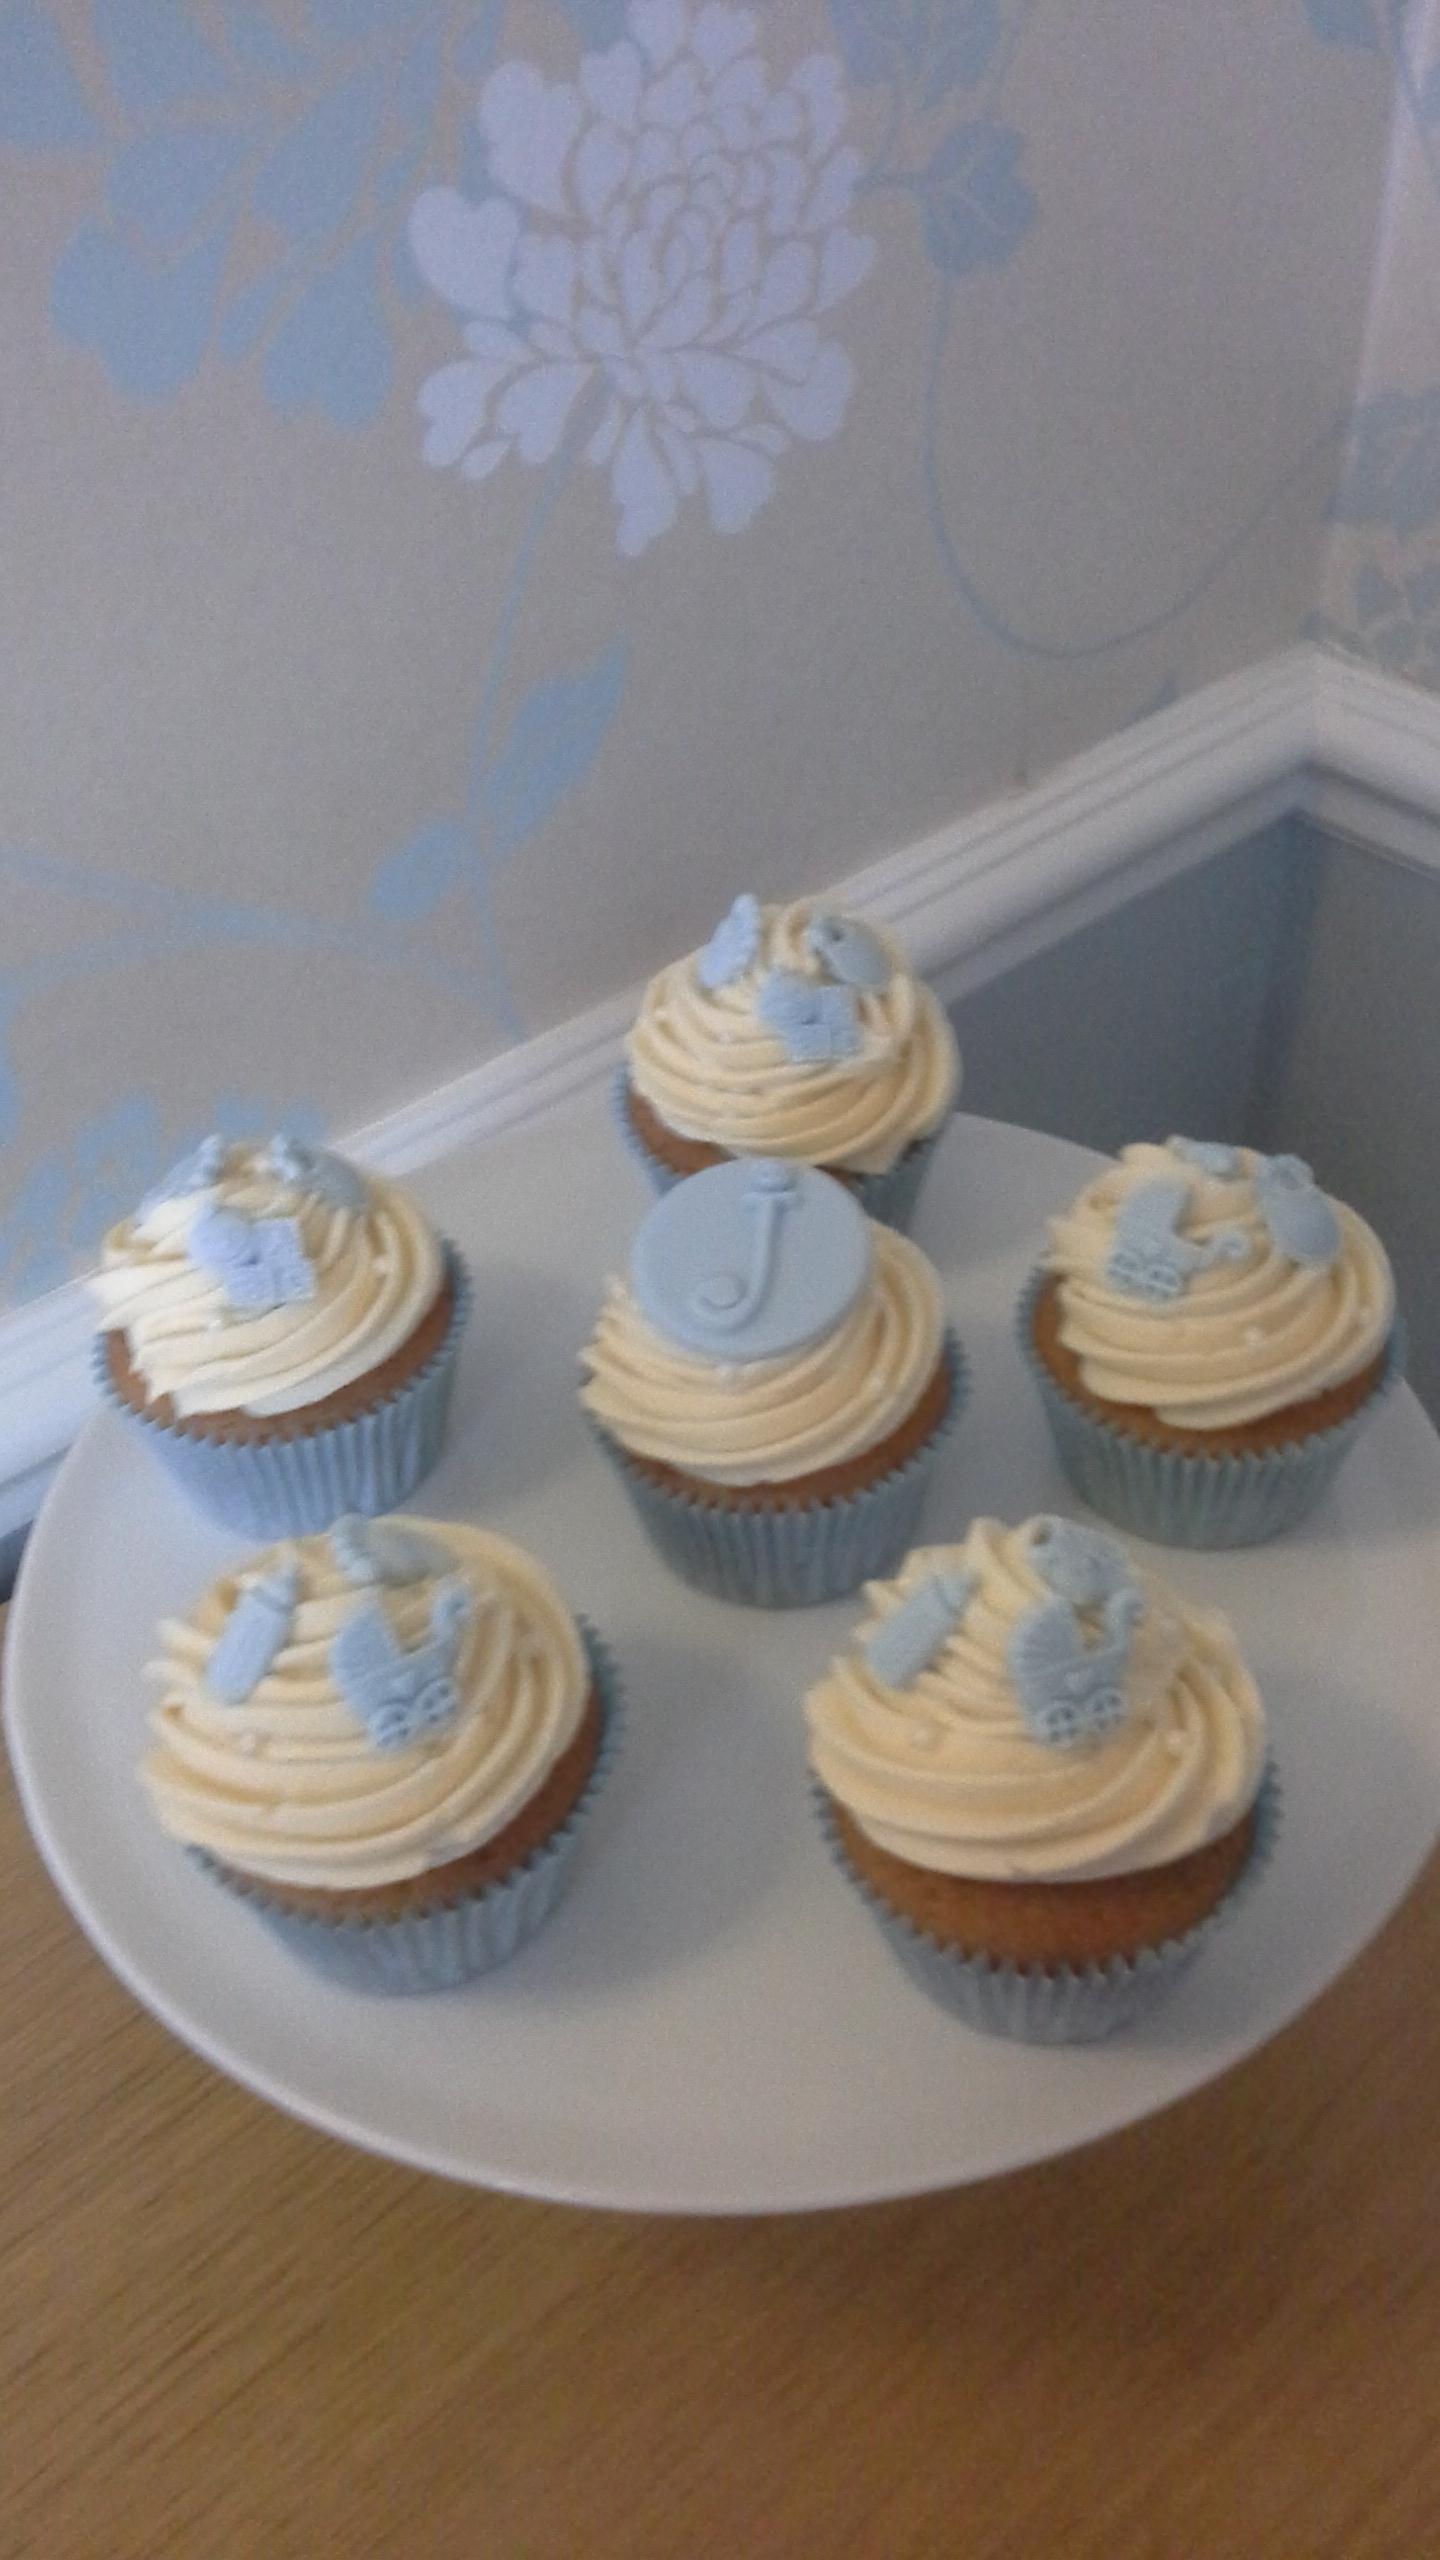 Ough What a Cake 3 Cupcake